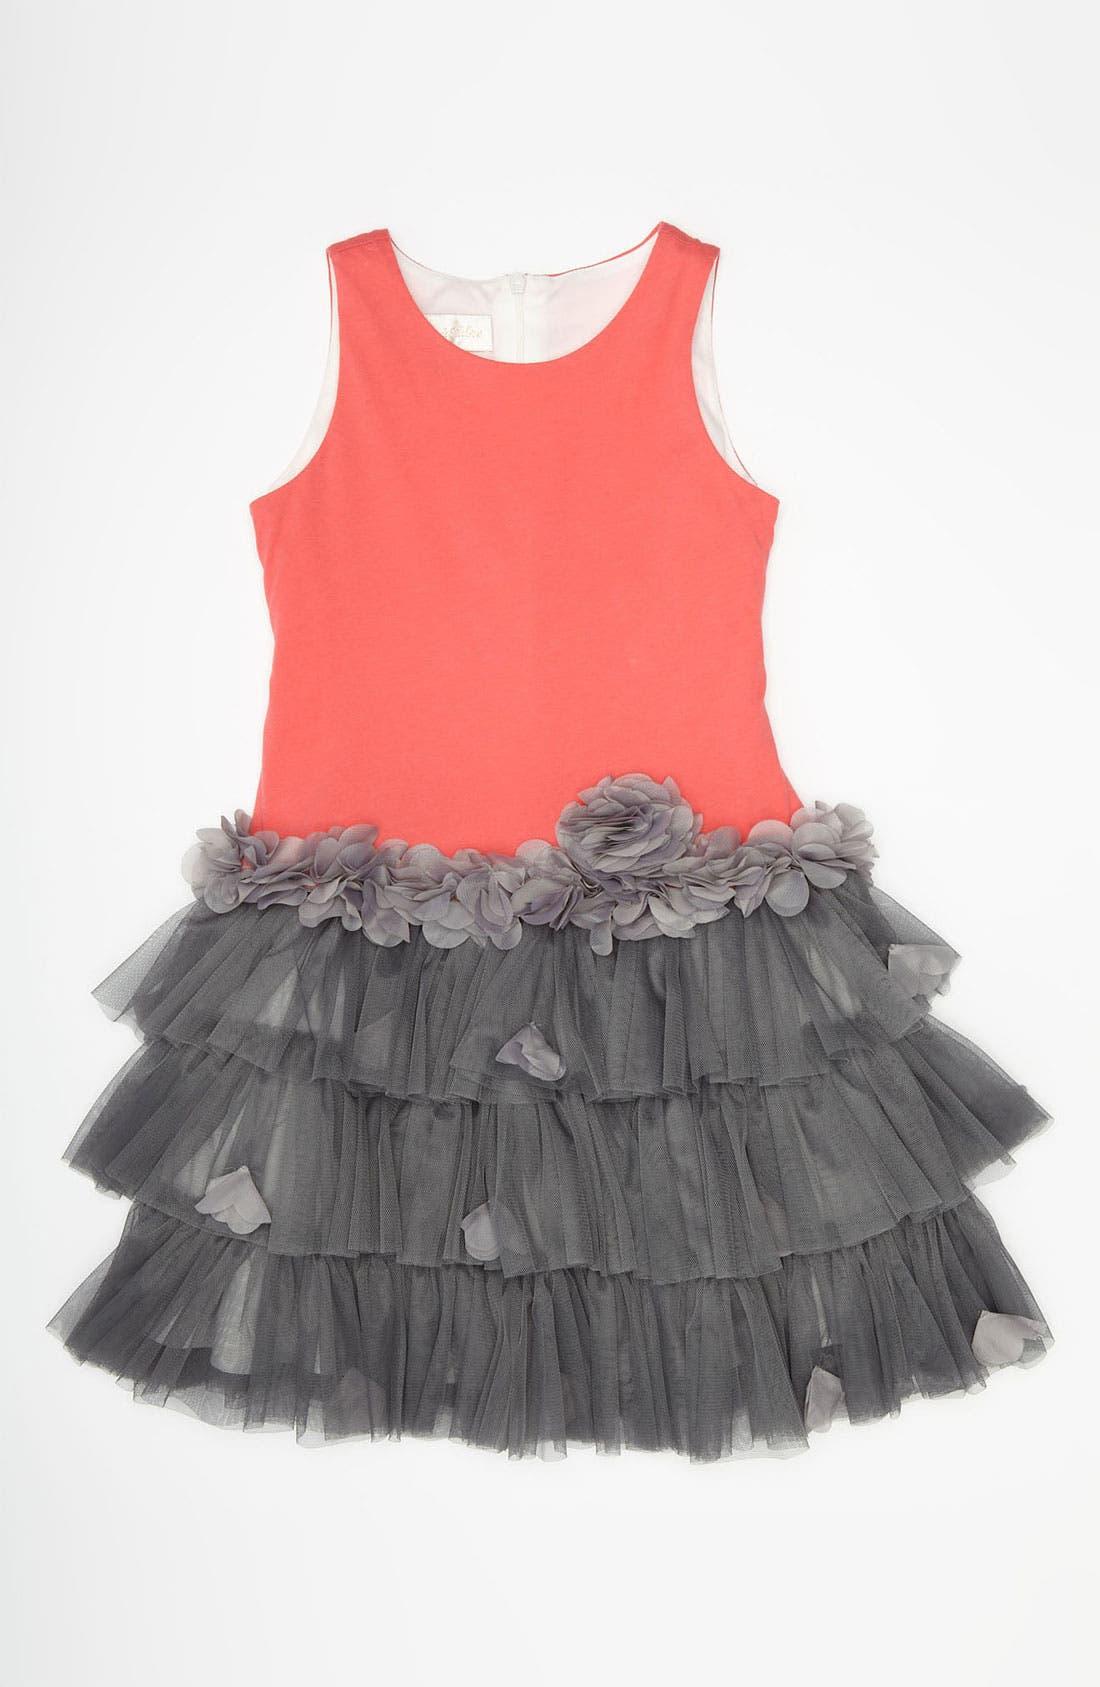 Main Image - Isobella & Chloe Tutu Dress (Little Girls & Big Girls)